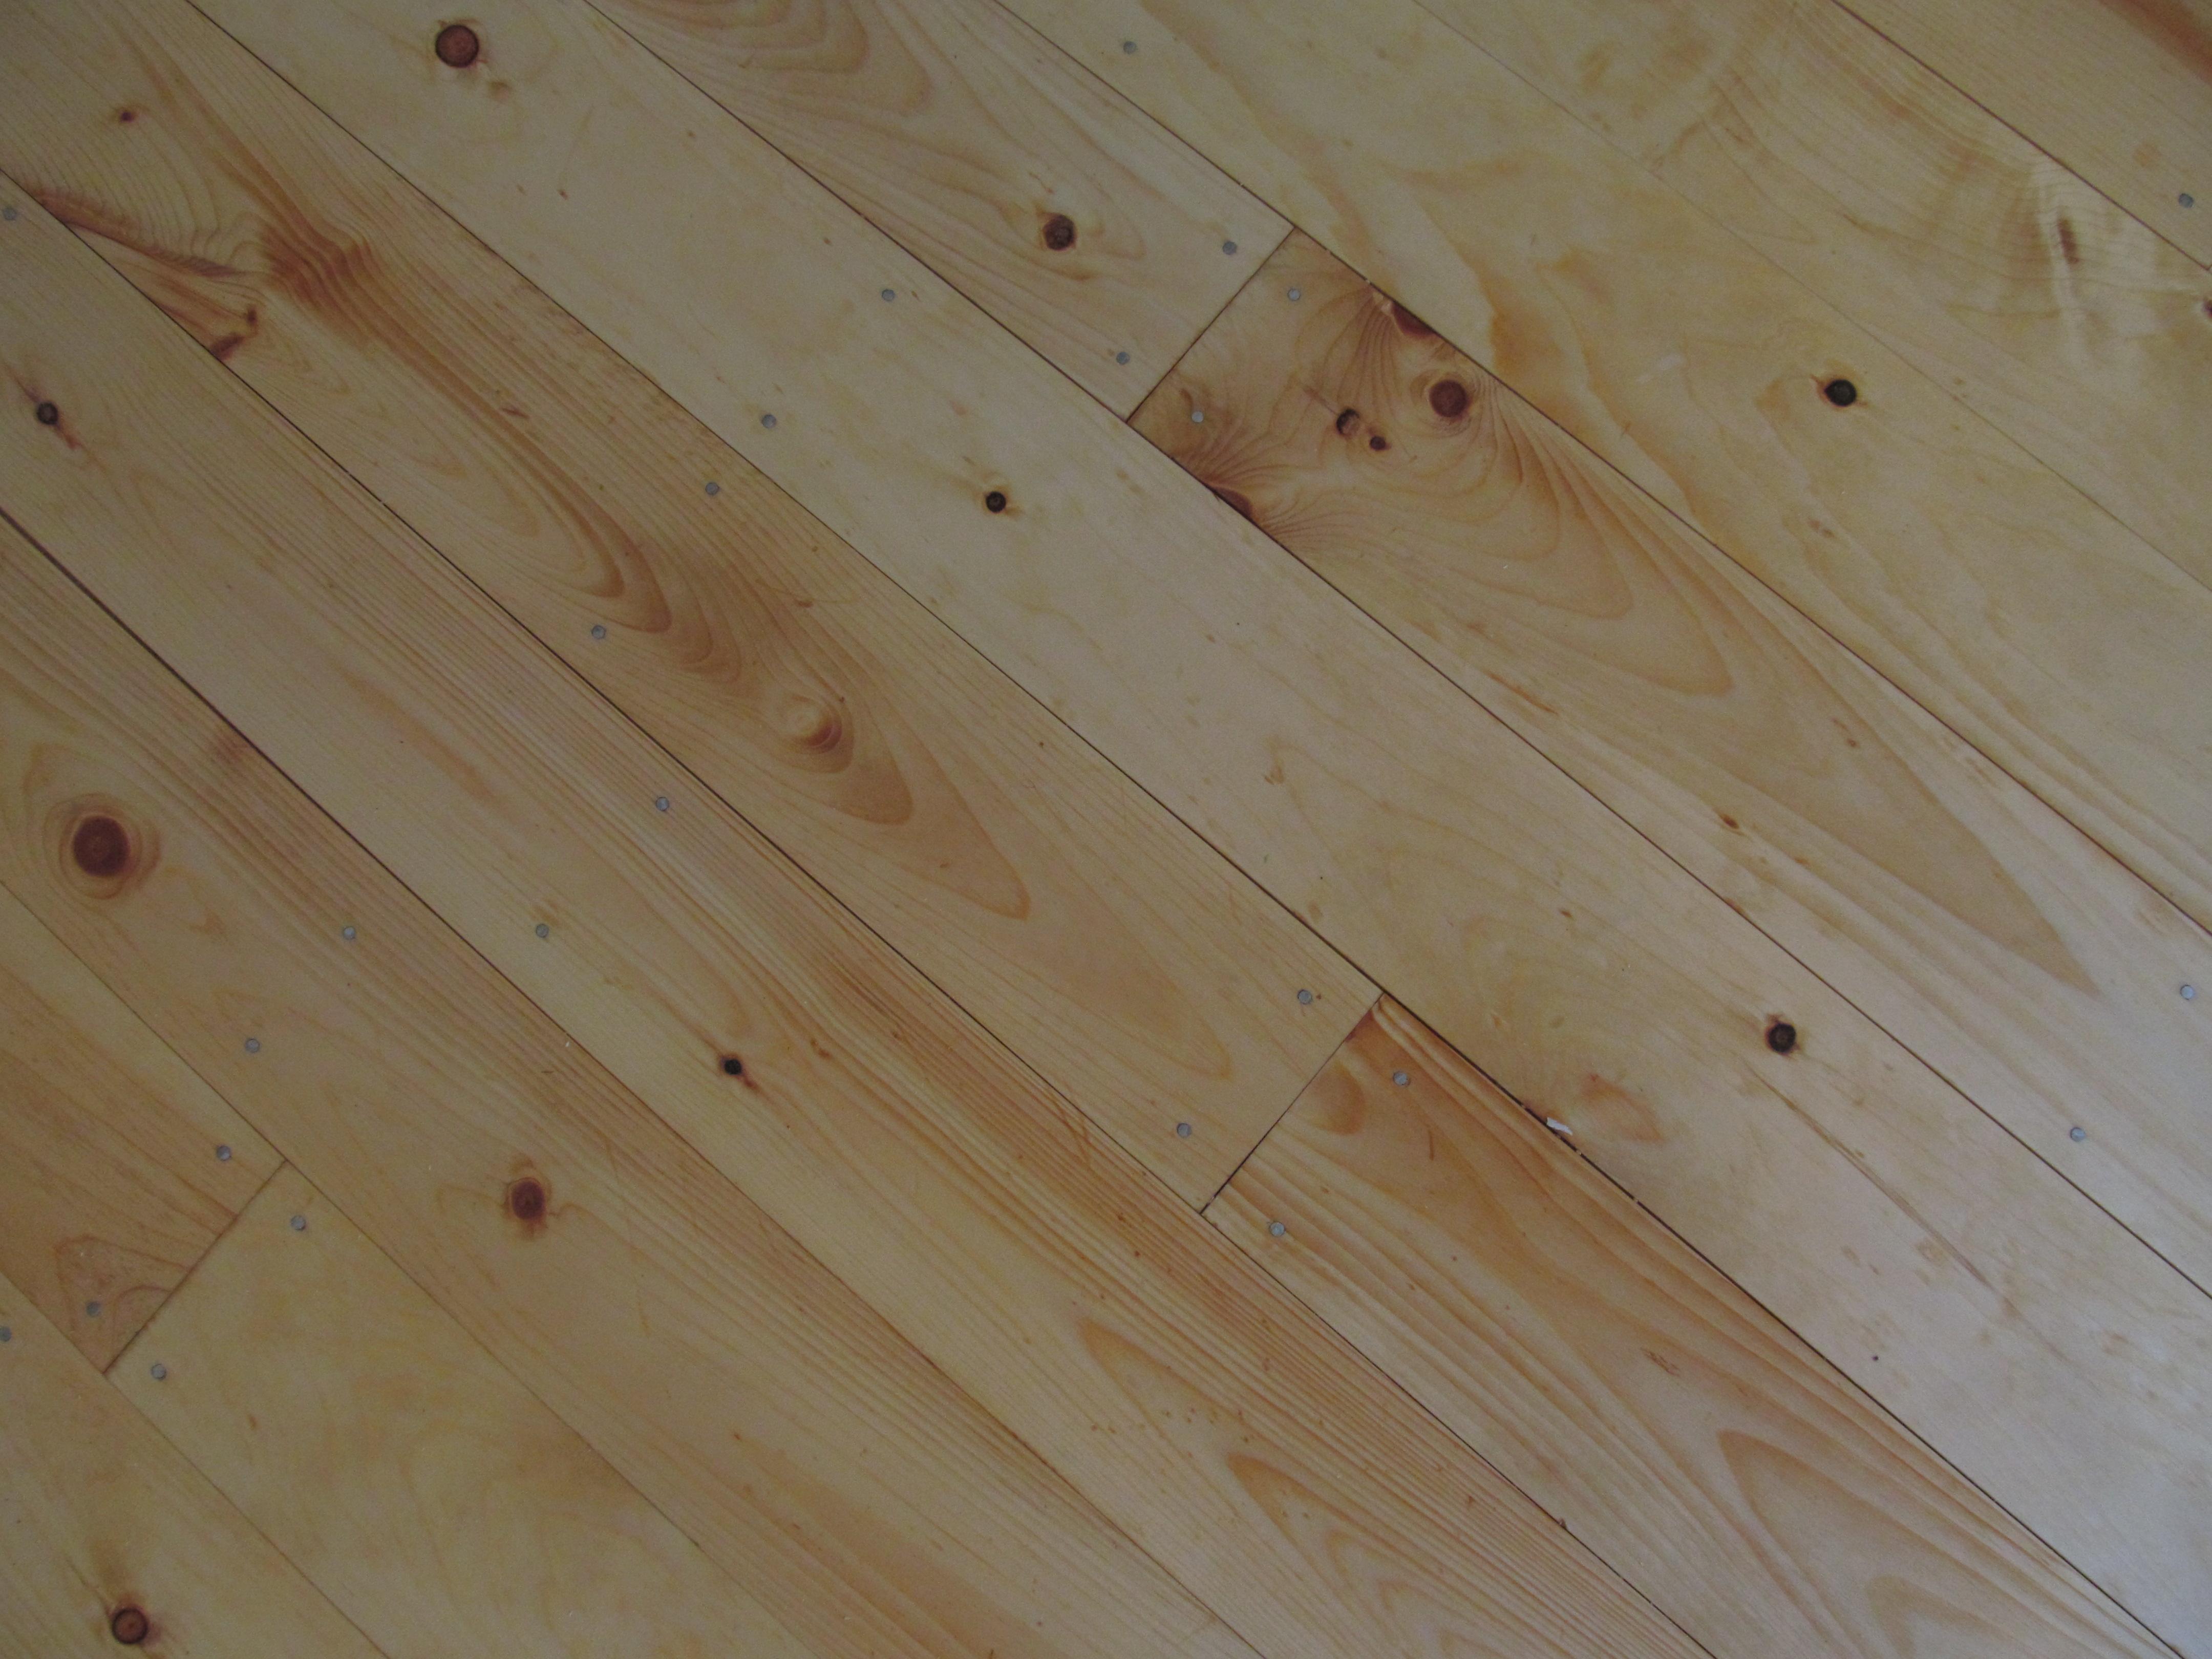 Tung Oil On Pine Floors Carpet Vidalondon